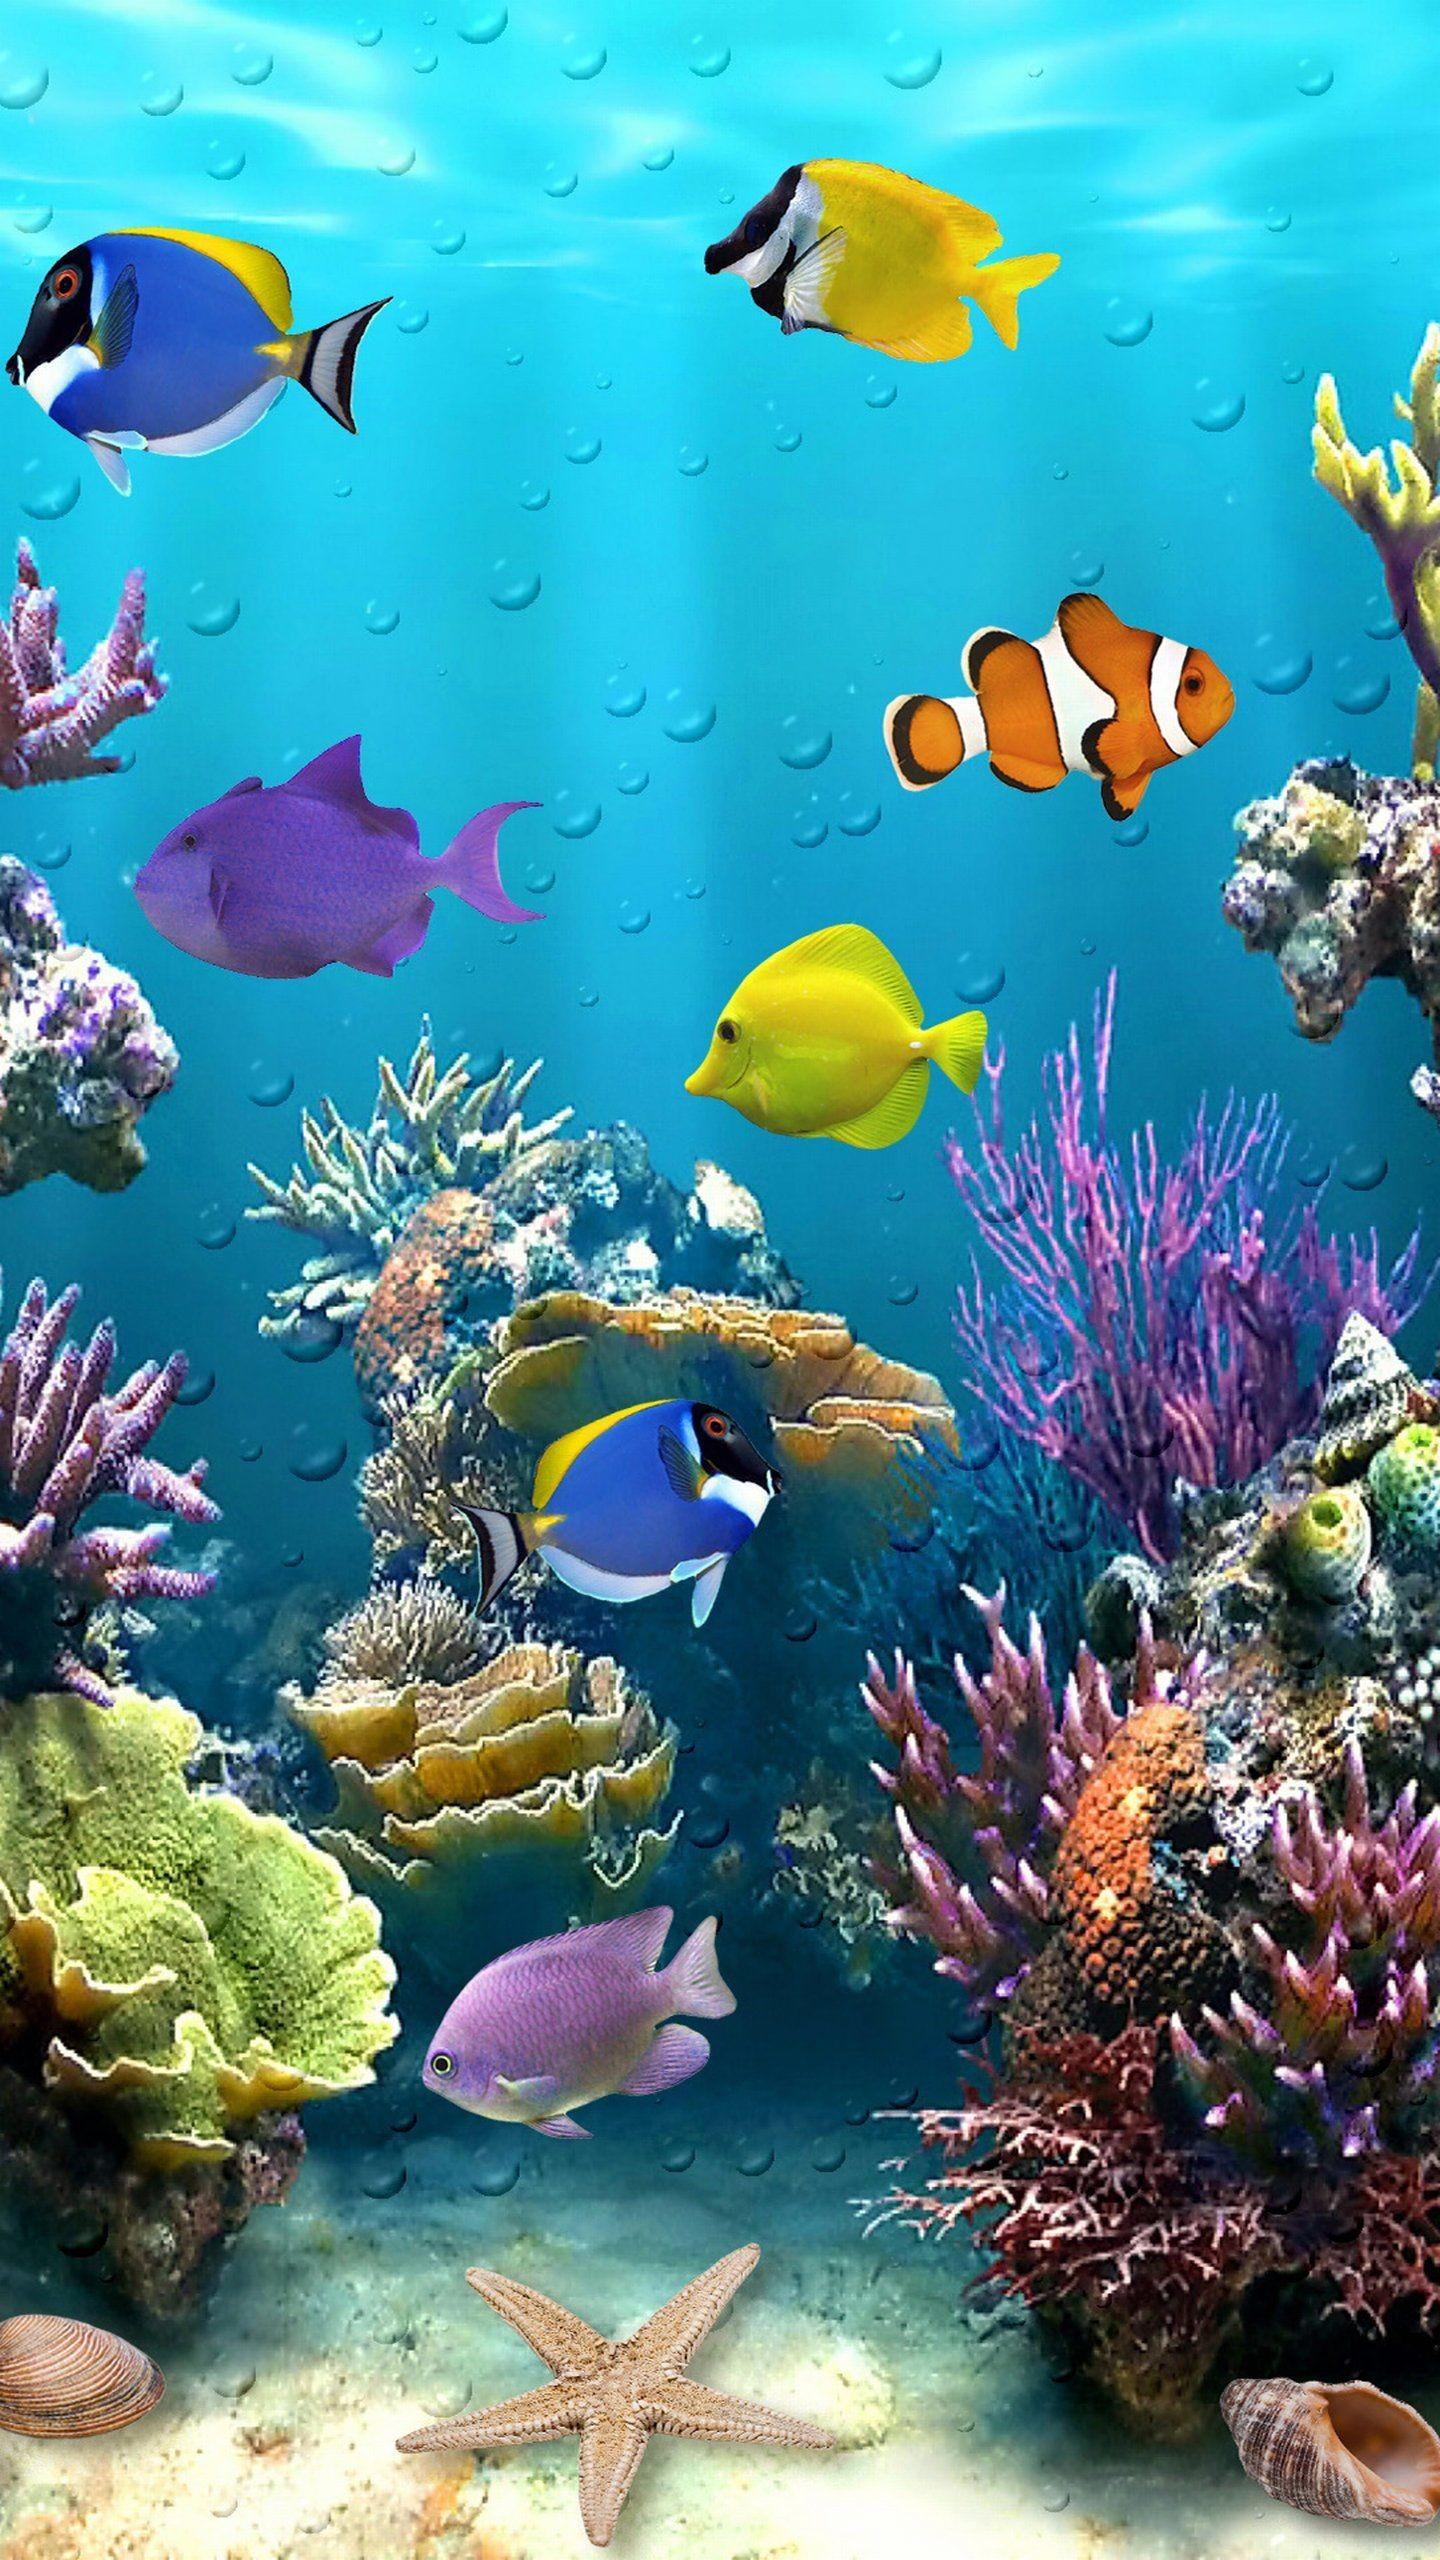 Res: 1440x2560, Beautiful Fish Tropical